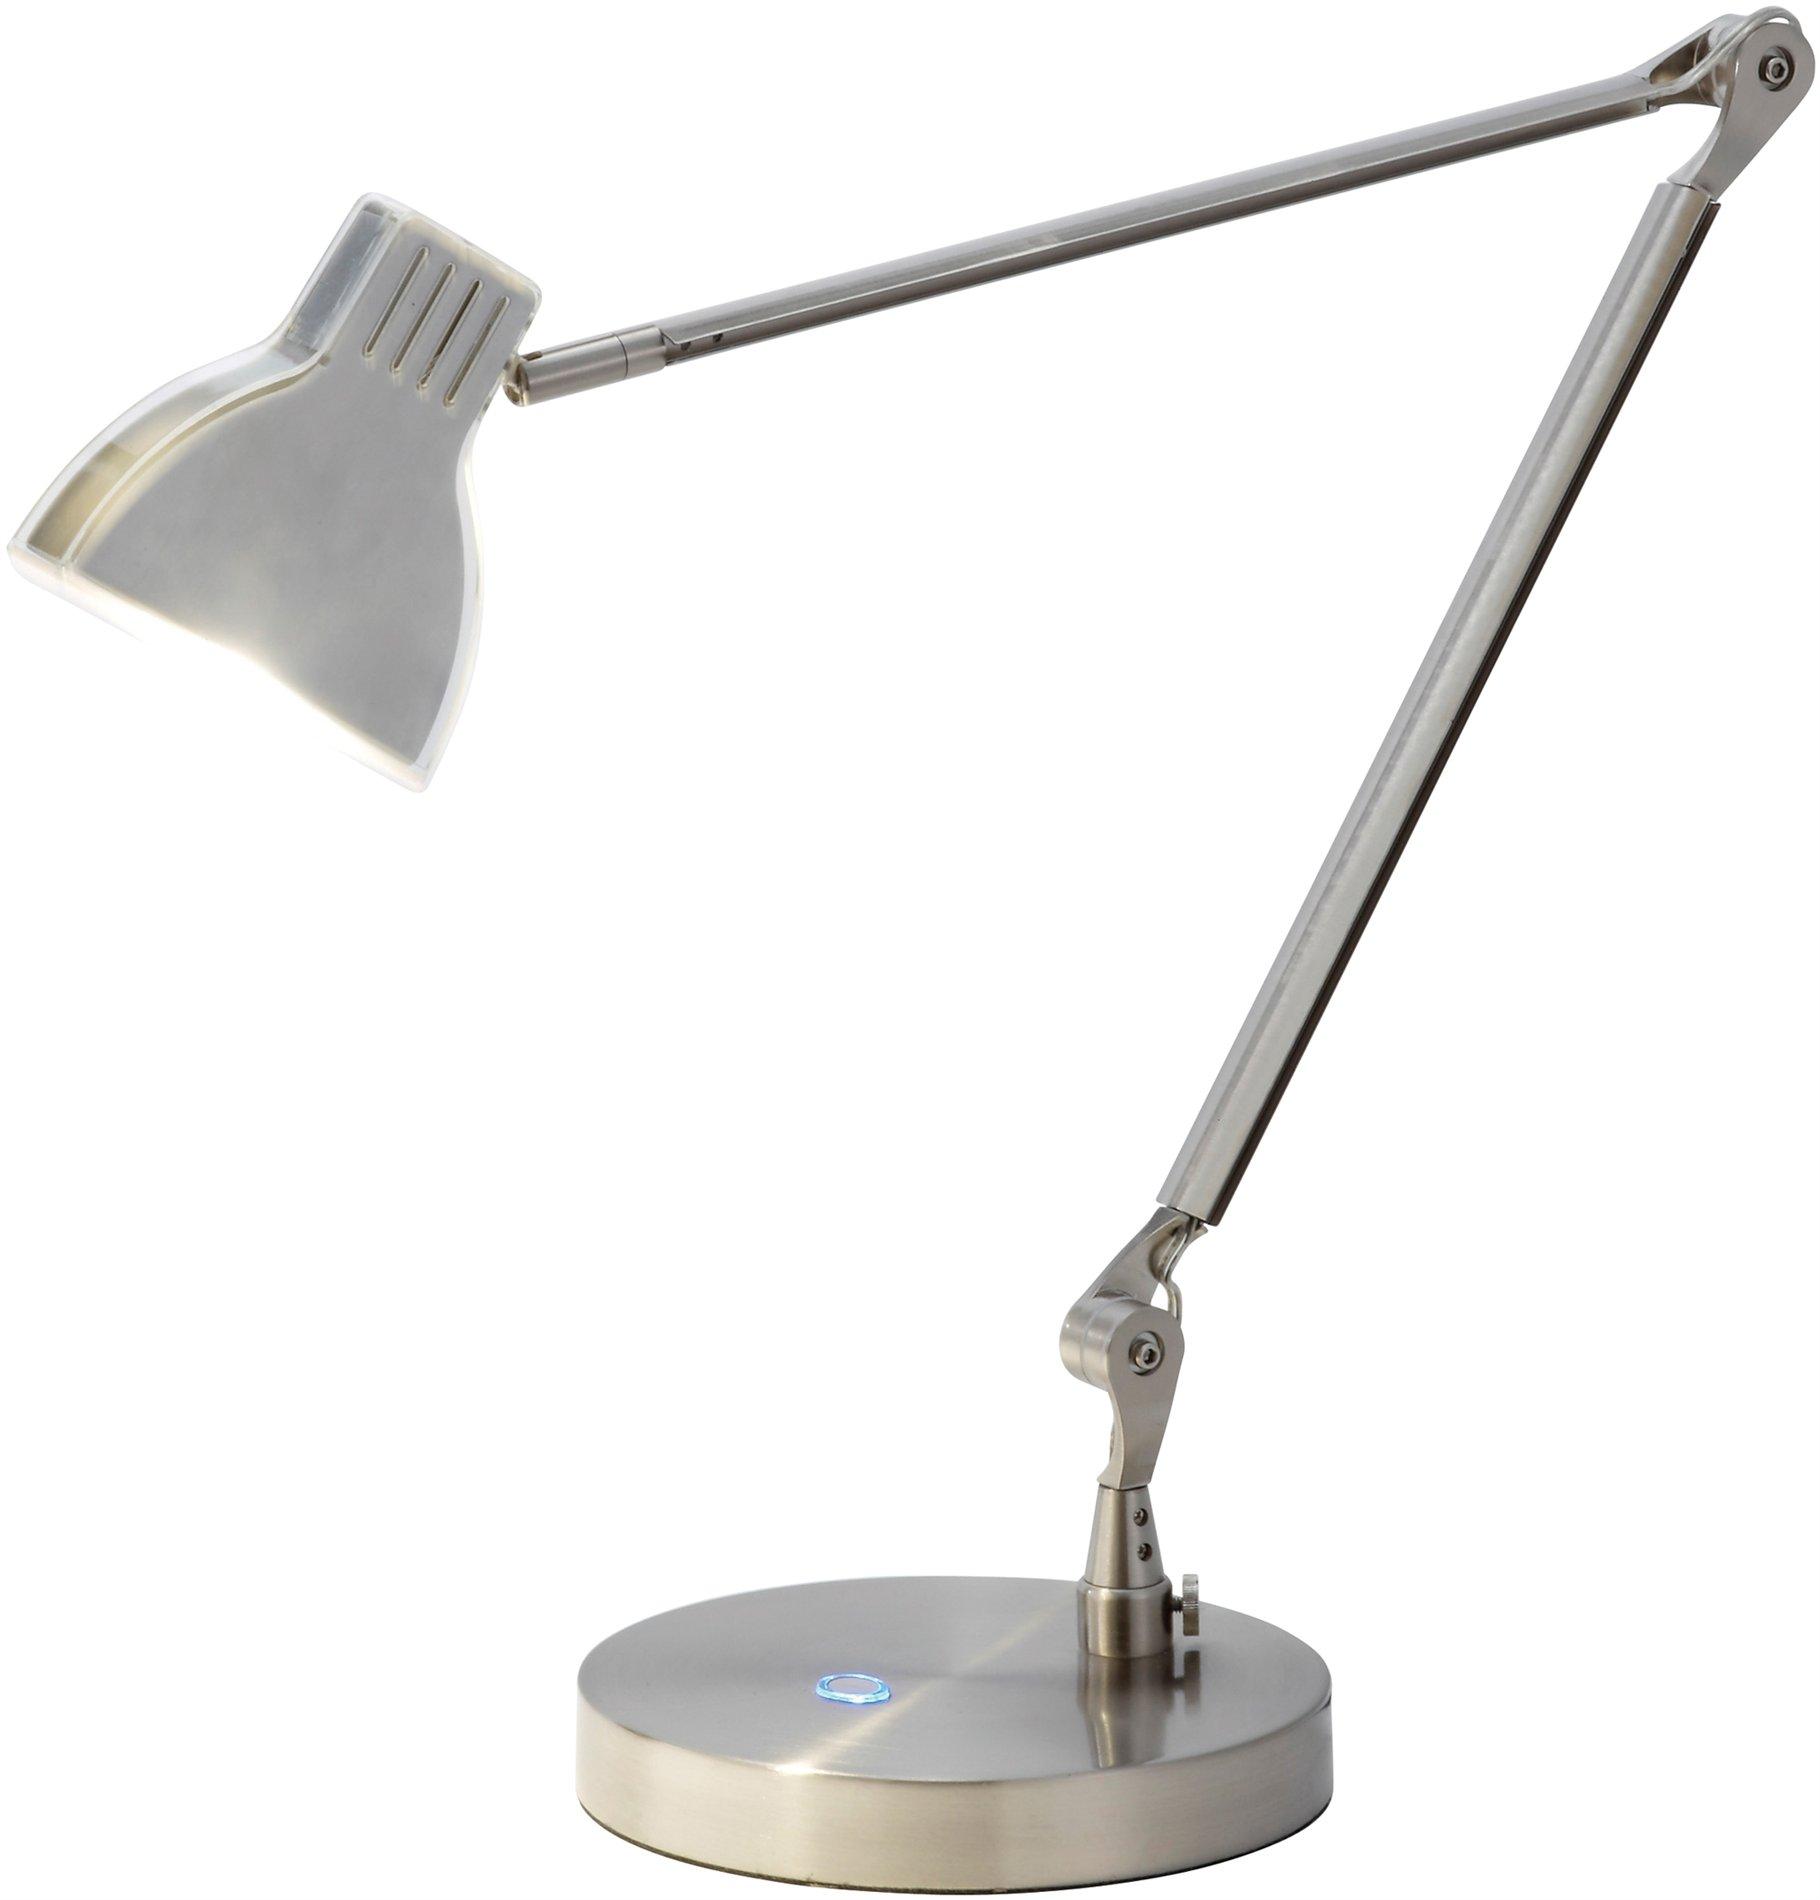 Adesso Architect Desk Lamp - tonyearnshaw.com